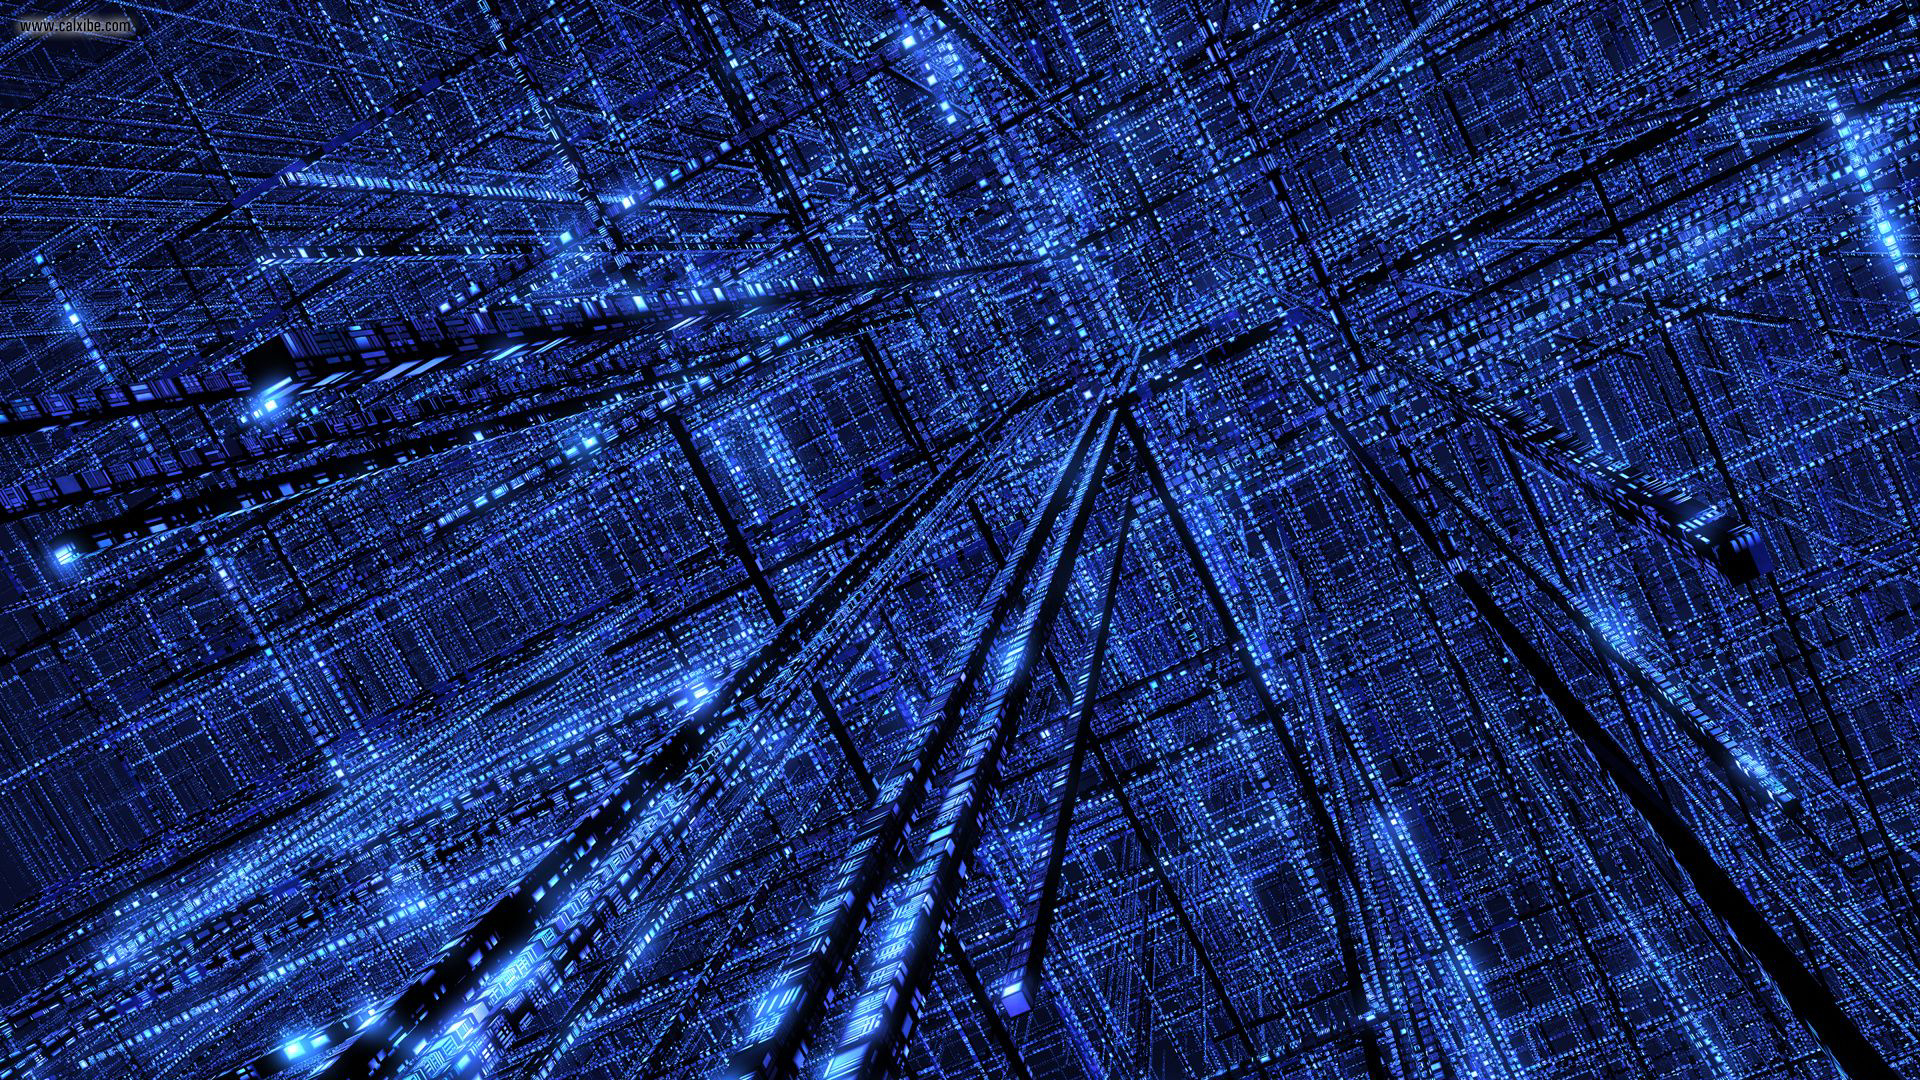 binary wallpaper wallpapersafari - photo #17